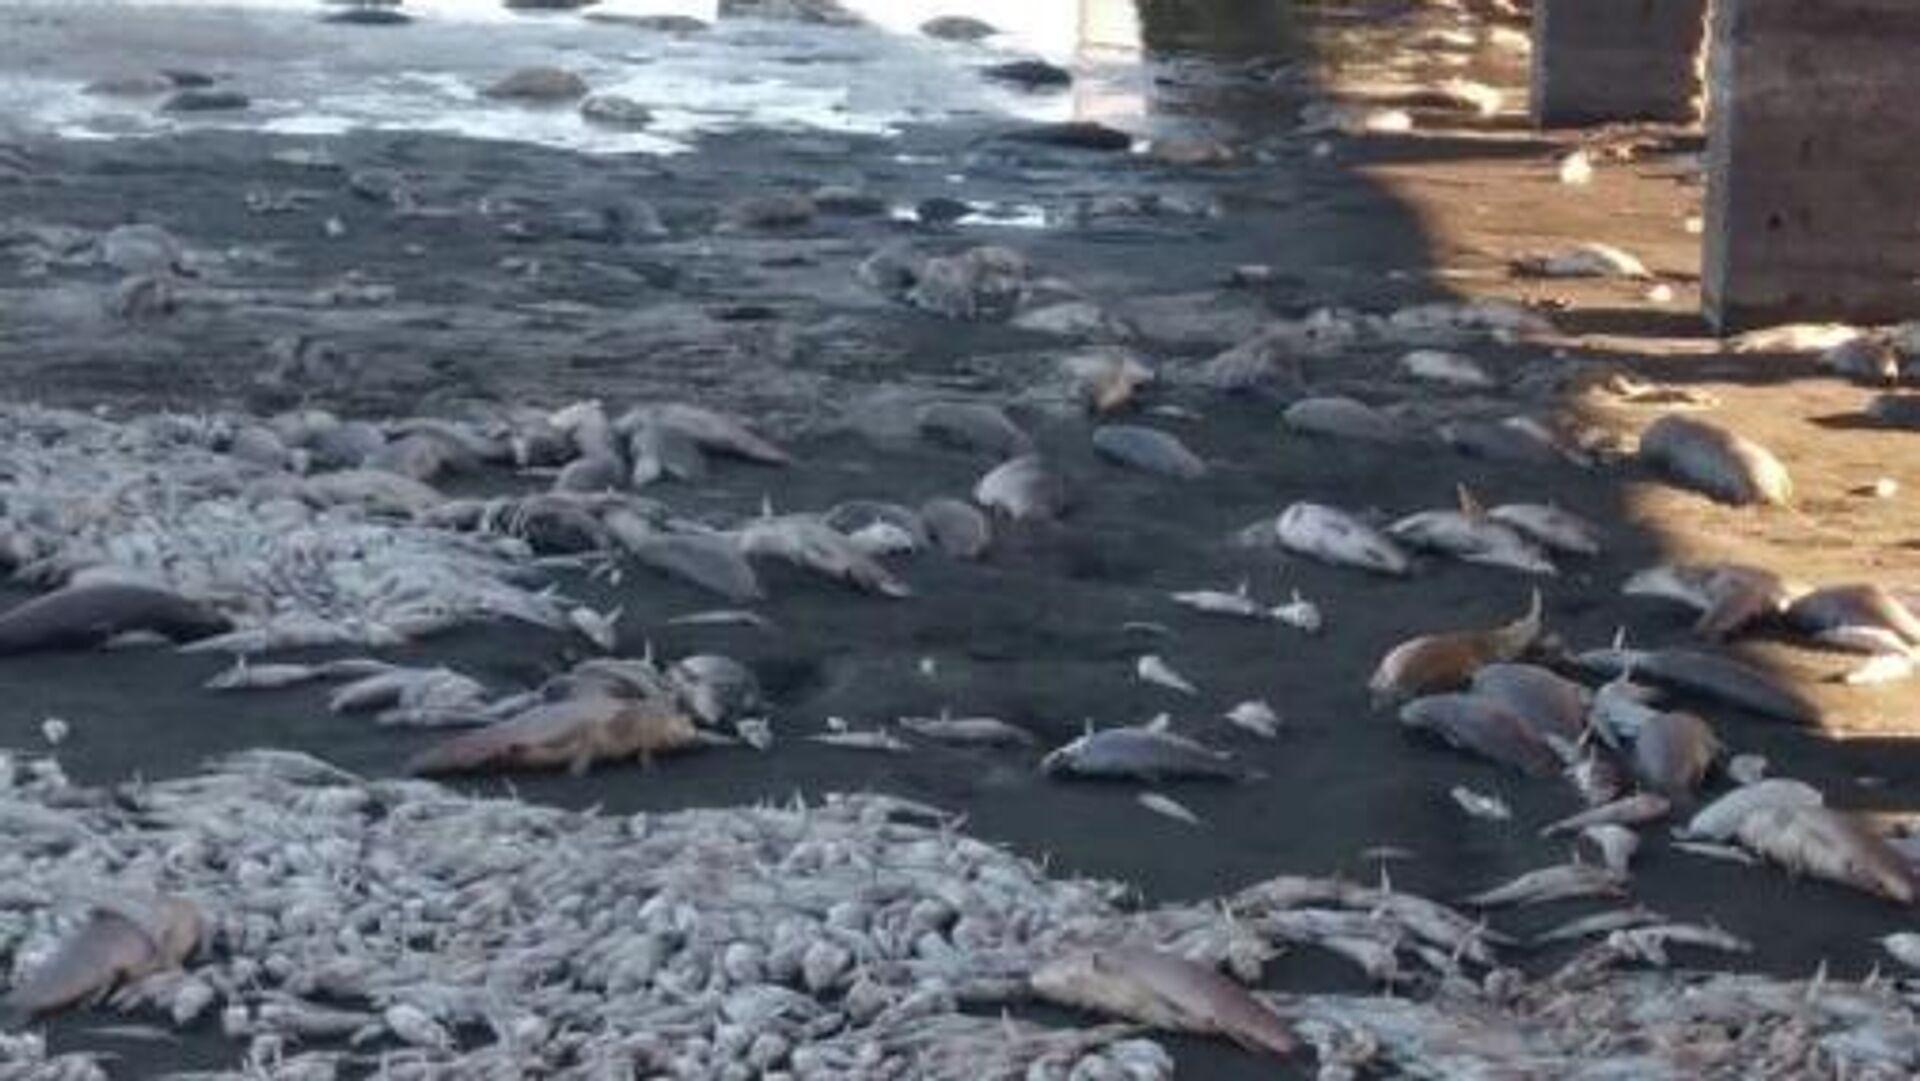 Miles de peces aparecen muertos en una laguna de Argentina - Sputnik Mundo, 1920, 13.04.2021